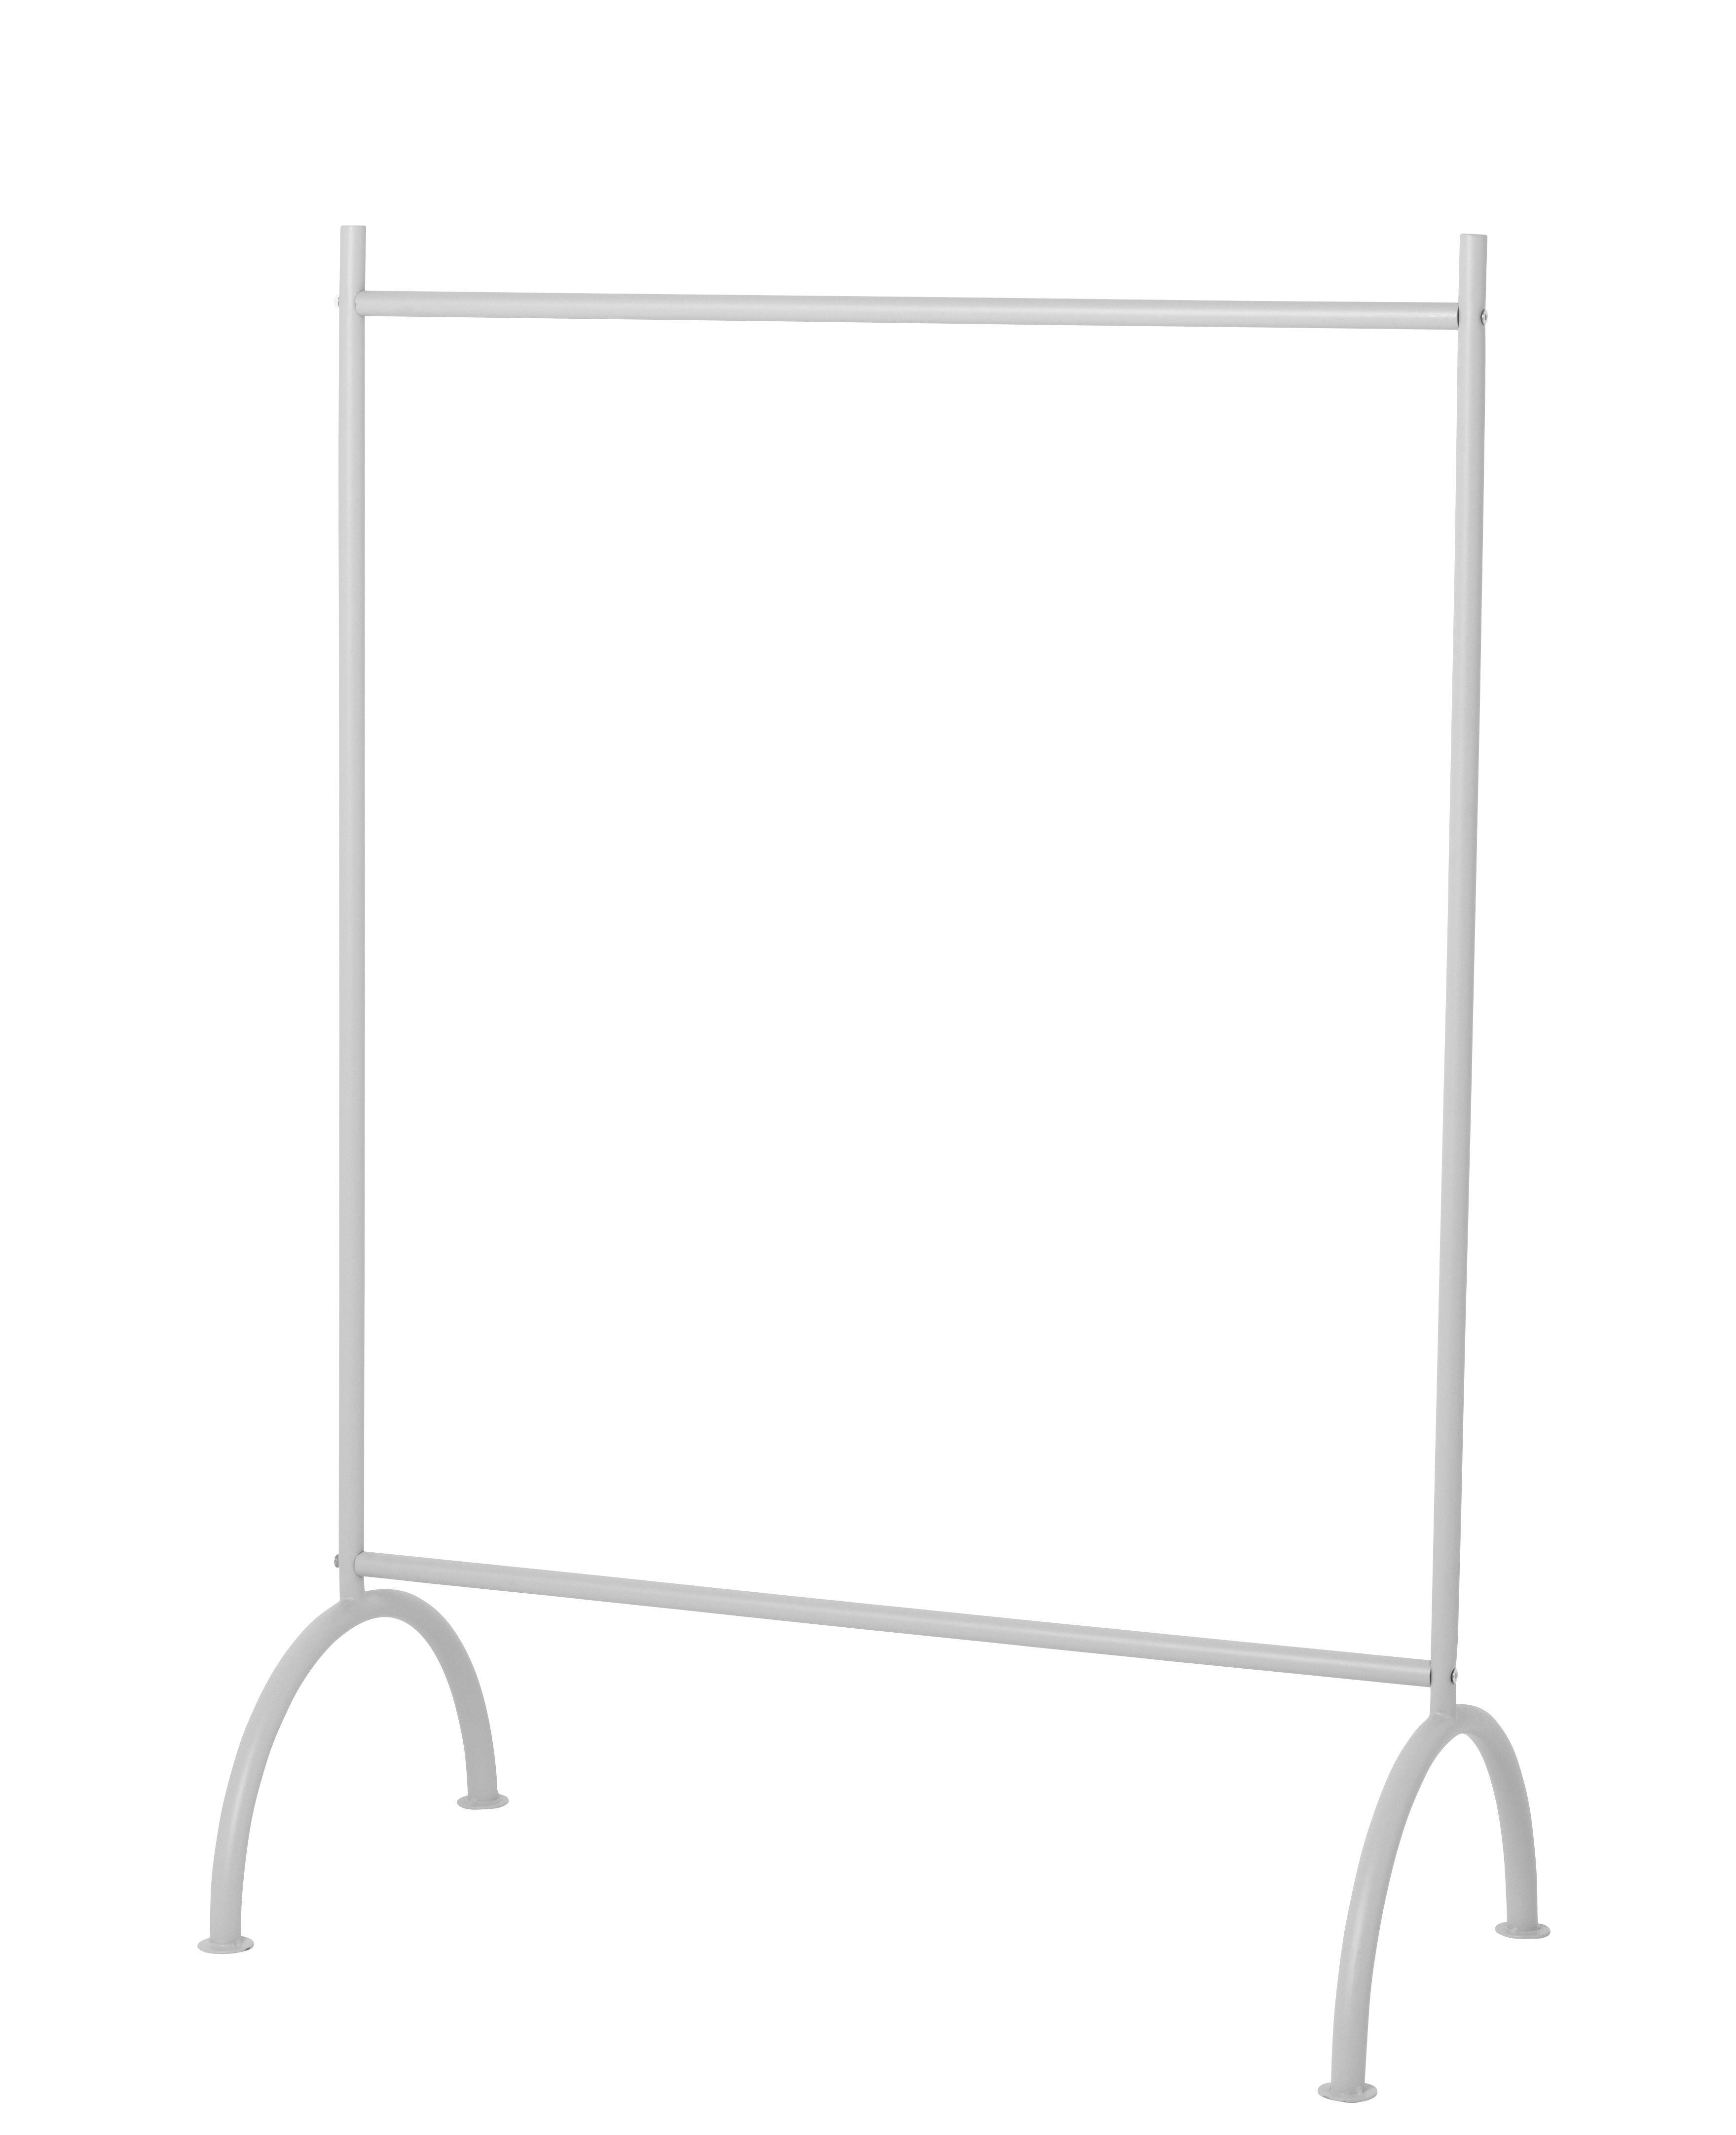 Furniture - Kids Furniture - Kids Rack - / L 88 x H 122,5 cm by Ferm Living - Gris - Brass, Metal